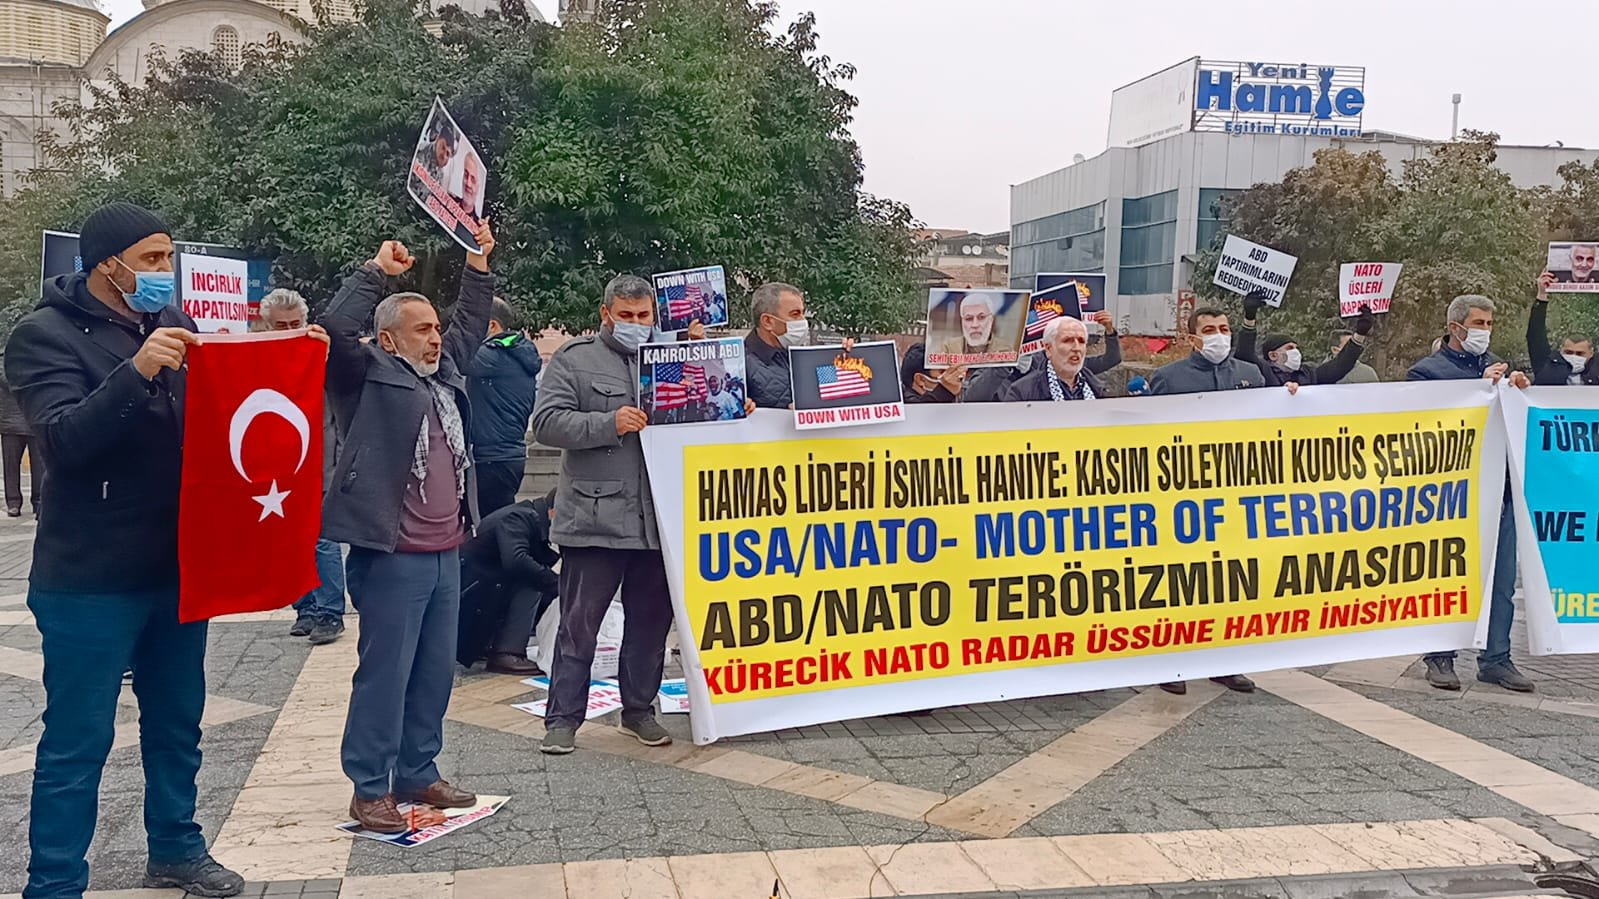 Malatya'da Terörist NATO ve Büyük Şeytan ABD Protesto Edildi (Video-Foto)